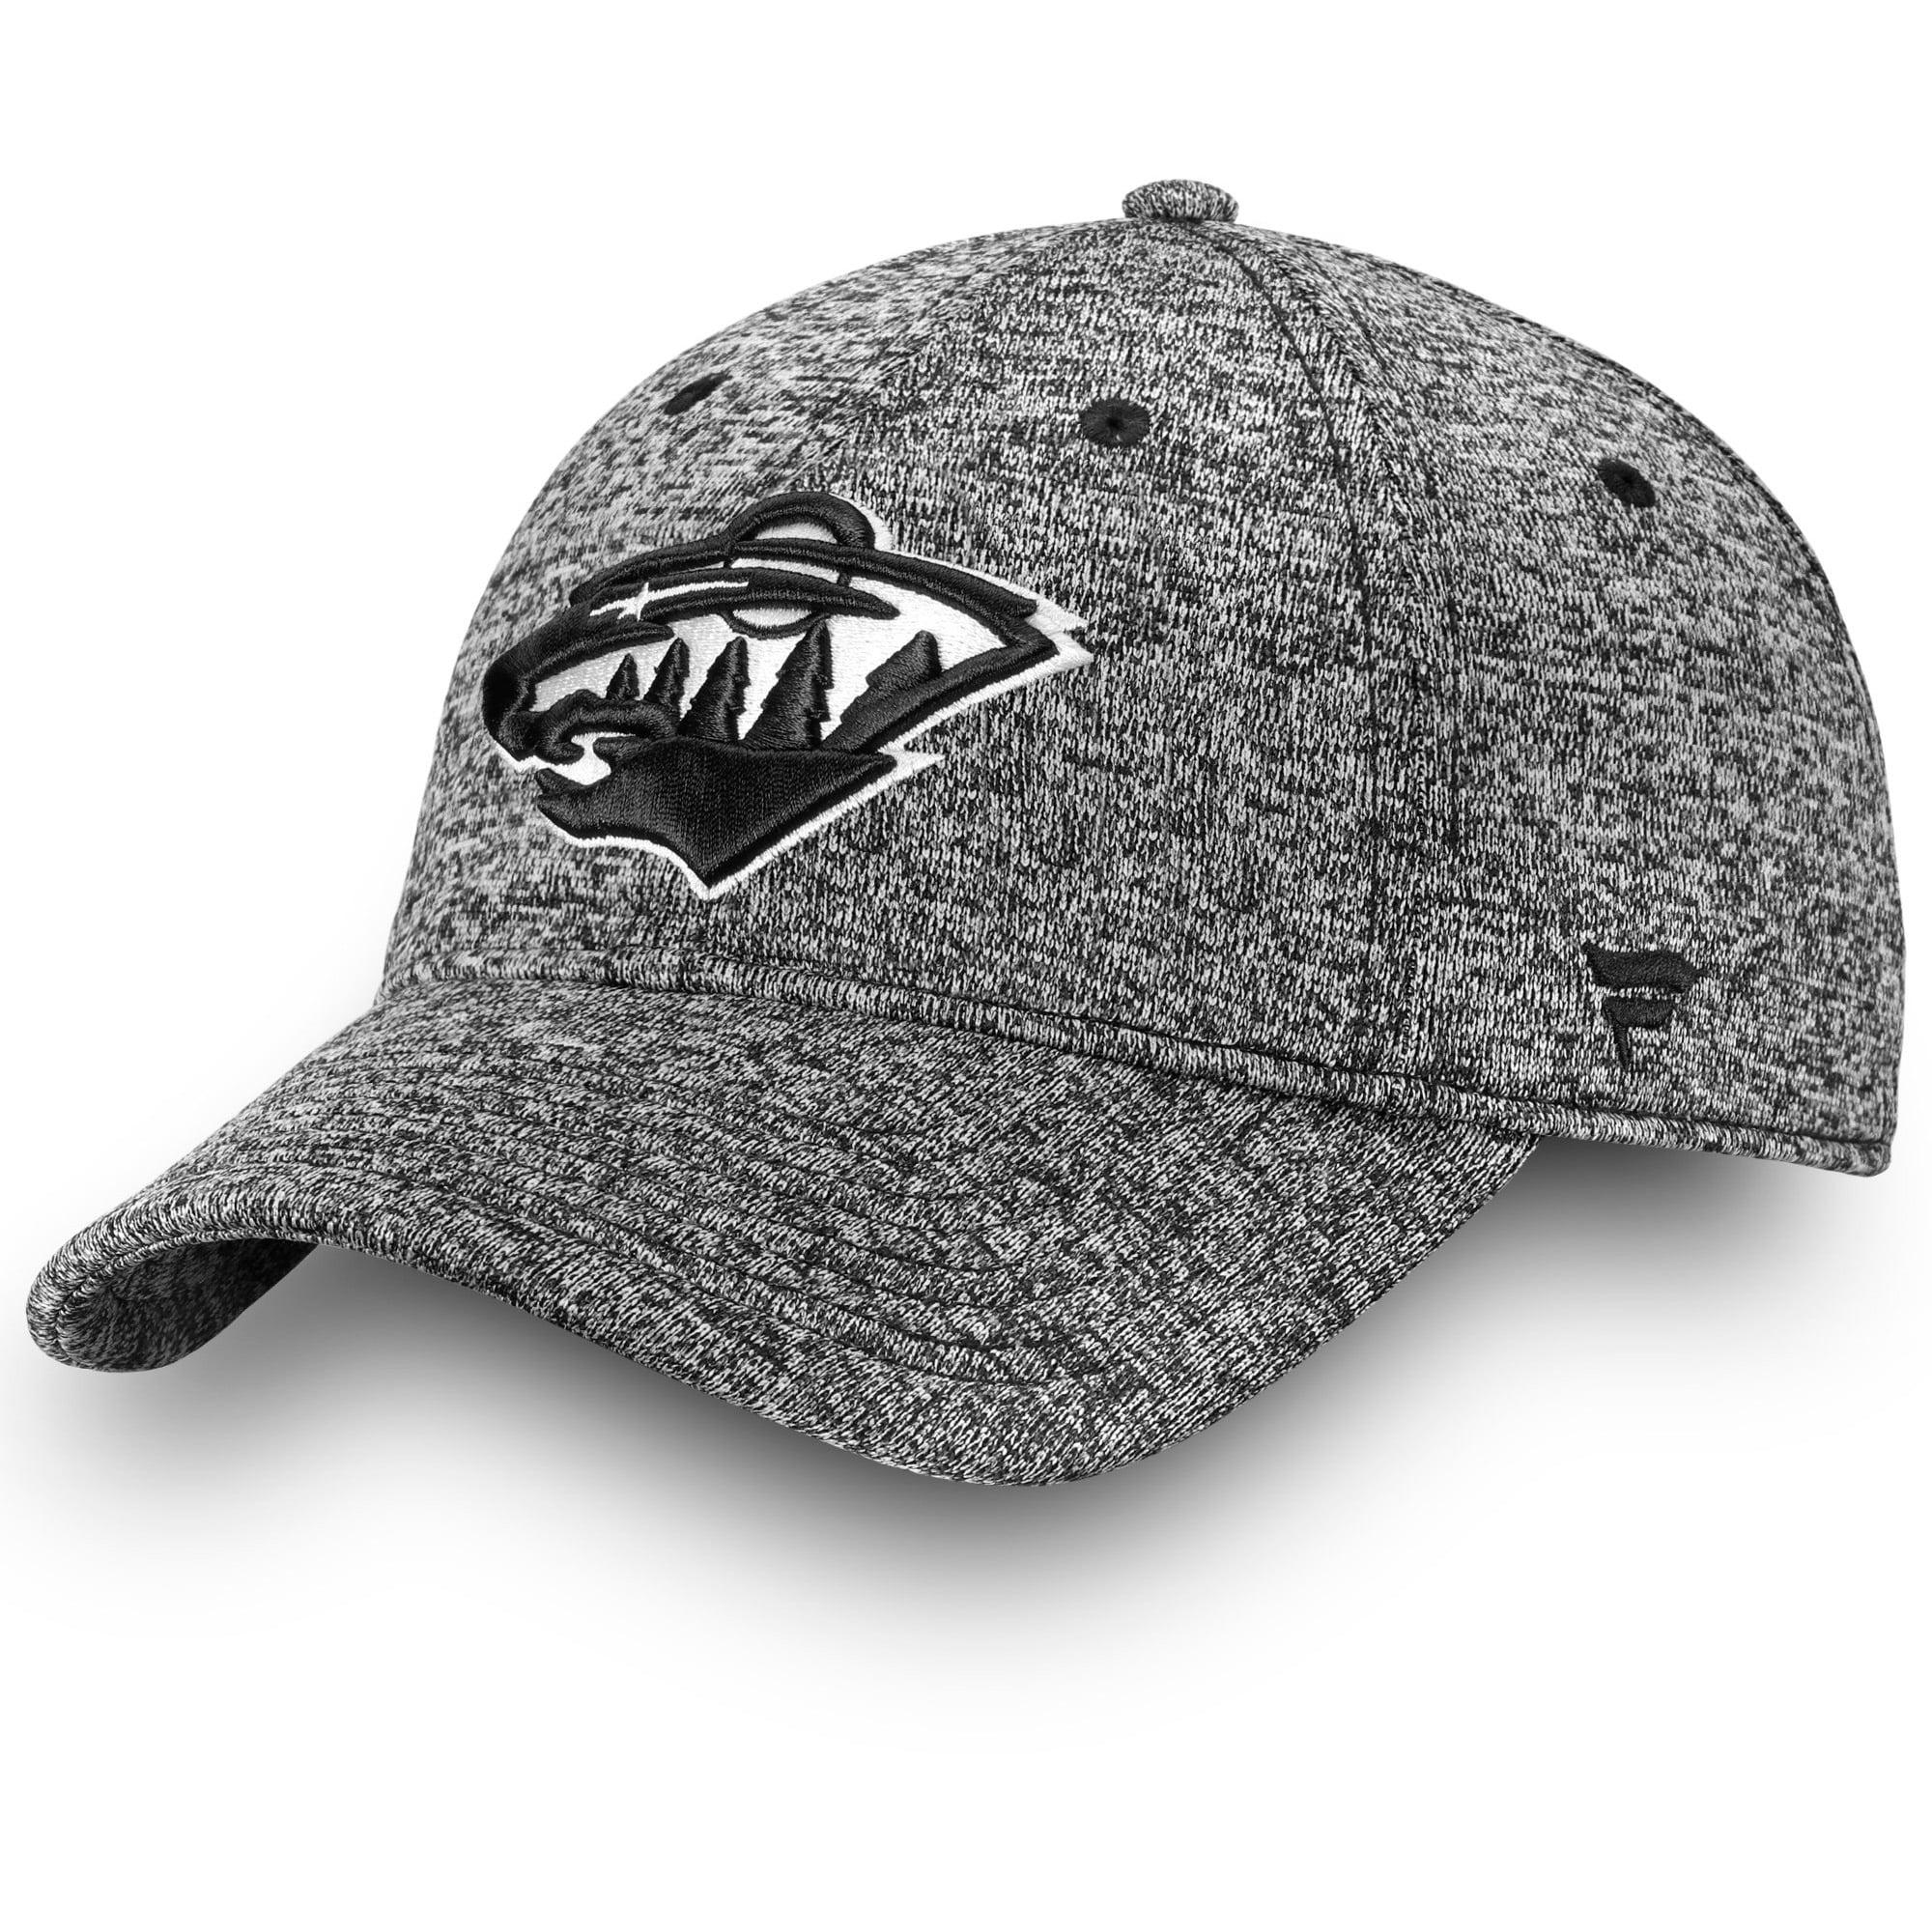 size 40 5f8e1 9e746 ... where can i buy minnesota wild fanatics branded black white fundamental  adjustable hat heathered black osfa